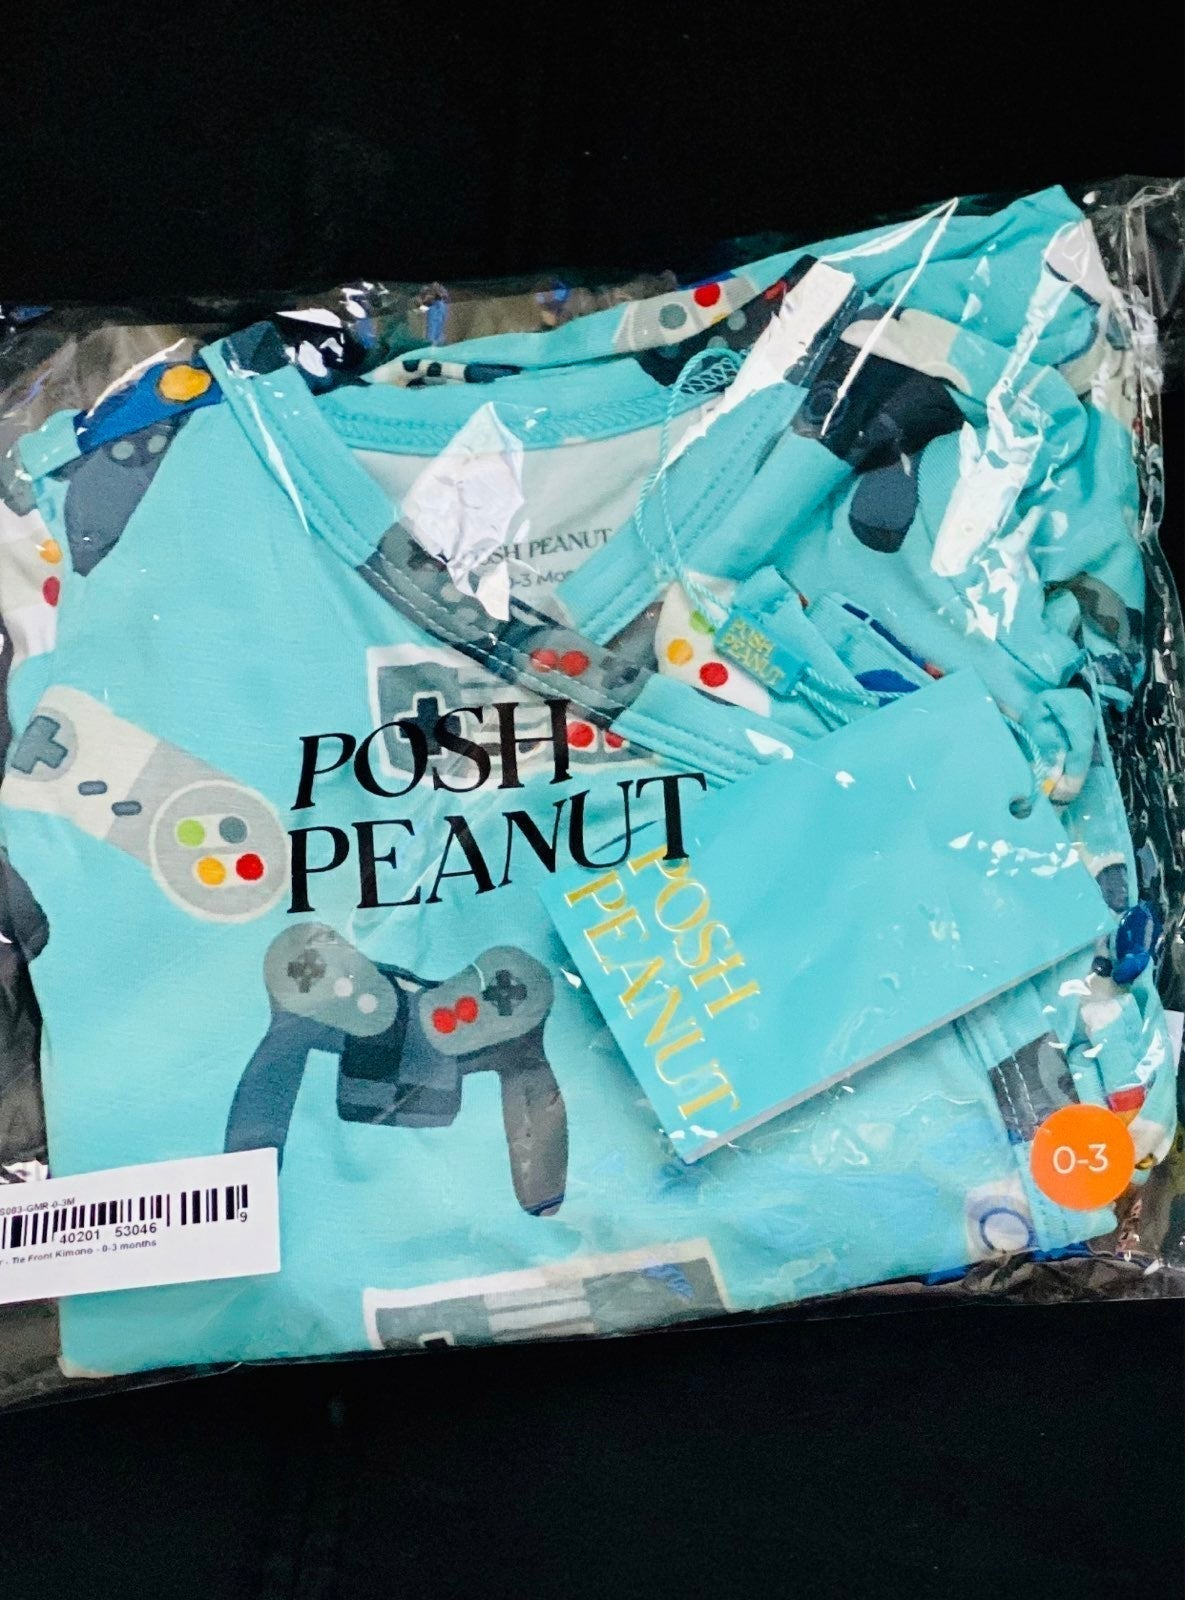 NEW Posh Peanut Gamer top and bottom set